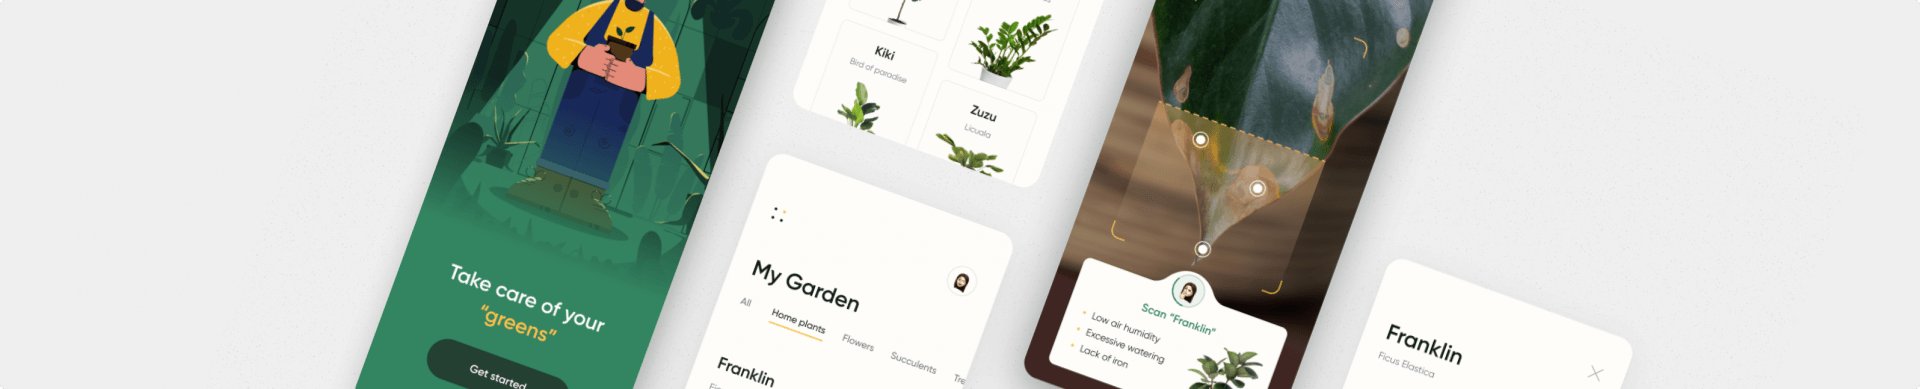 Mobile App Design Services 37